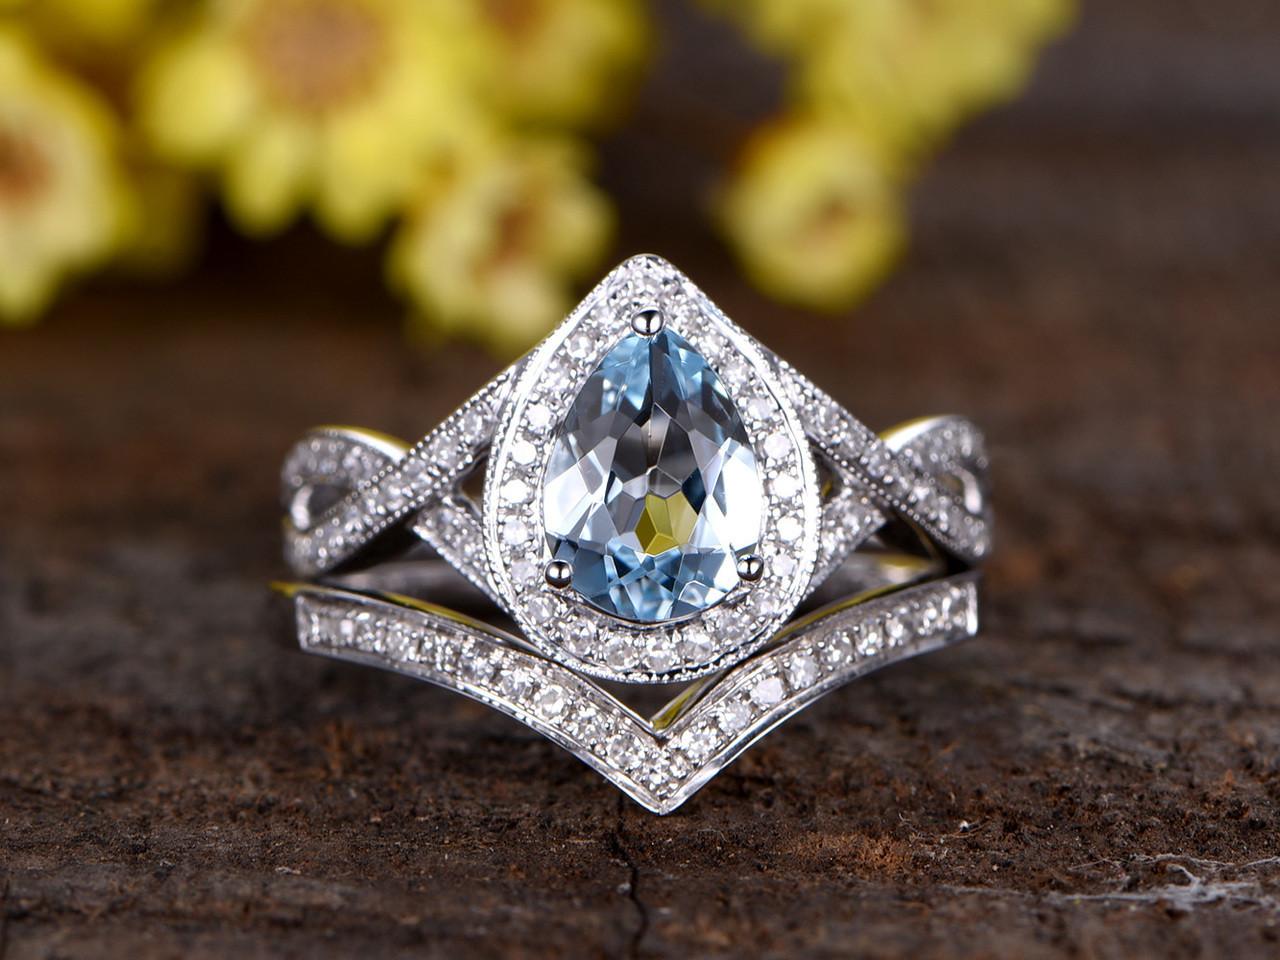 1.2 Carat Oval Aquamarine Bridal Set Diamond Wedding Ring 14k ...